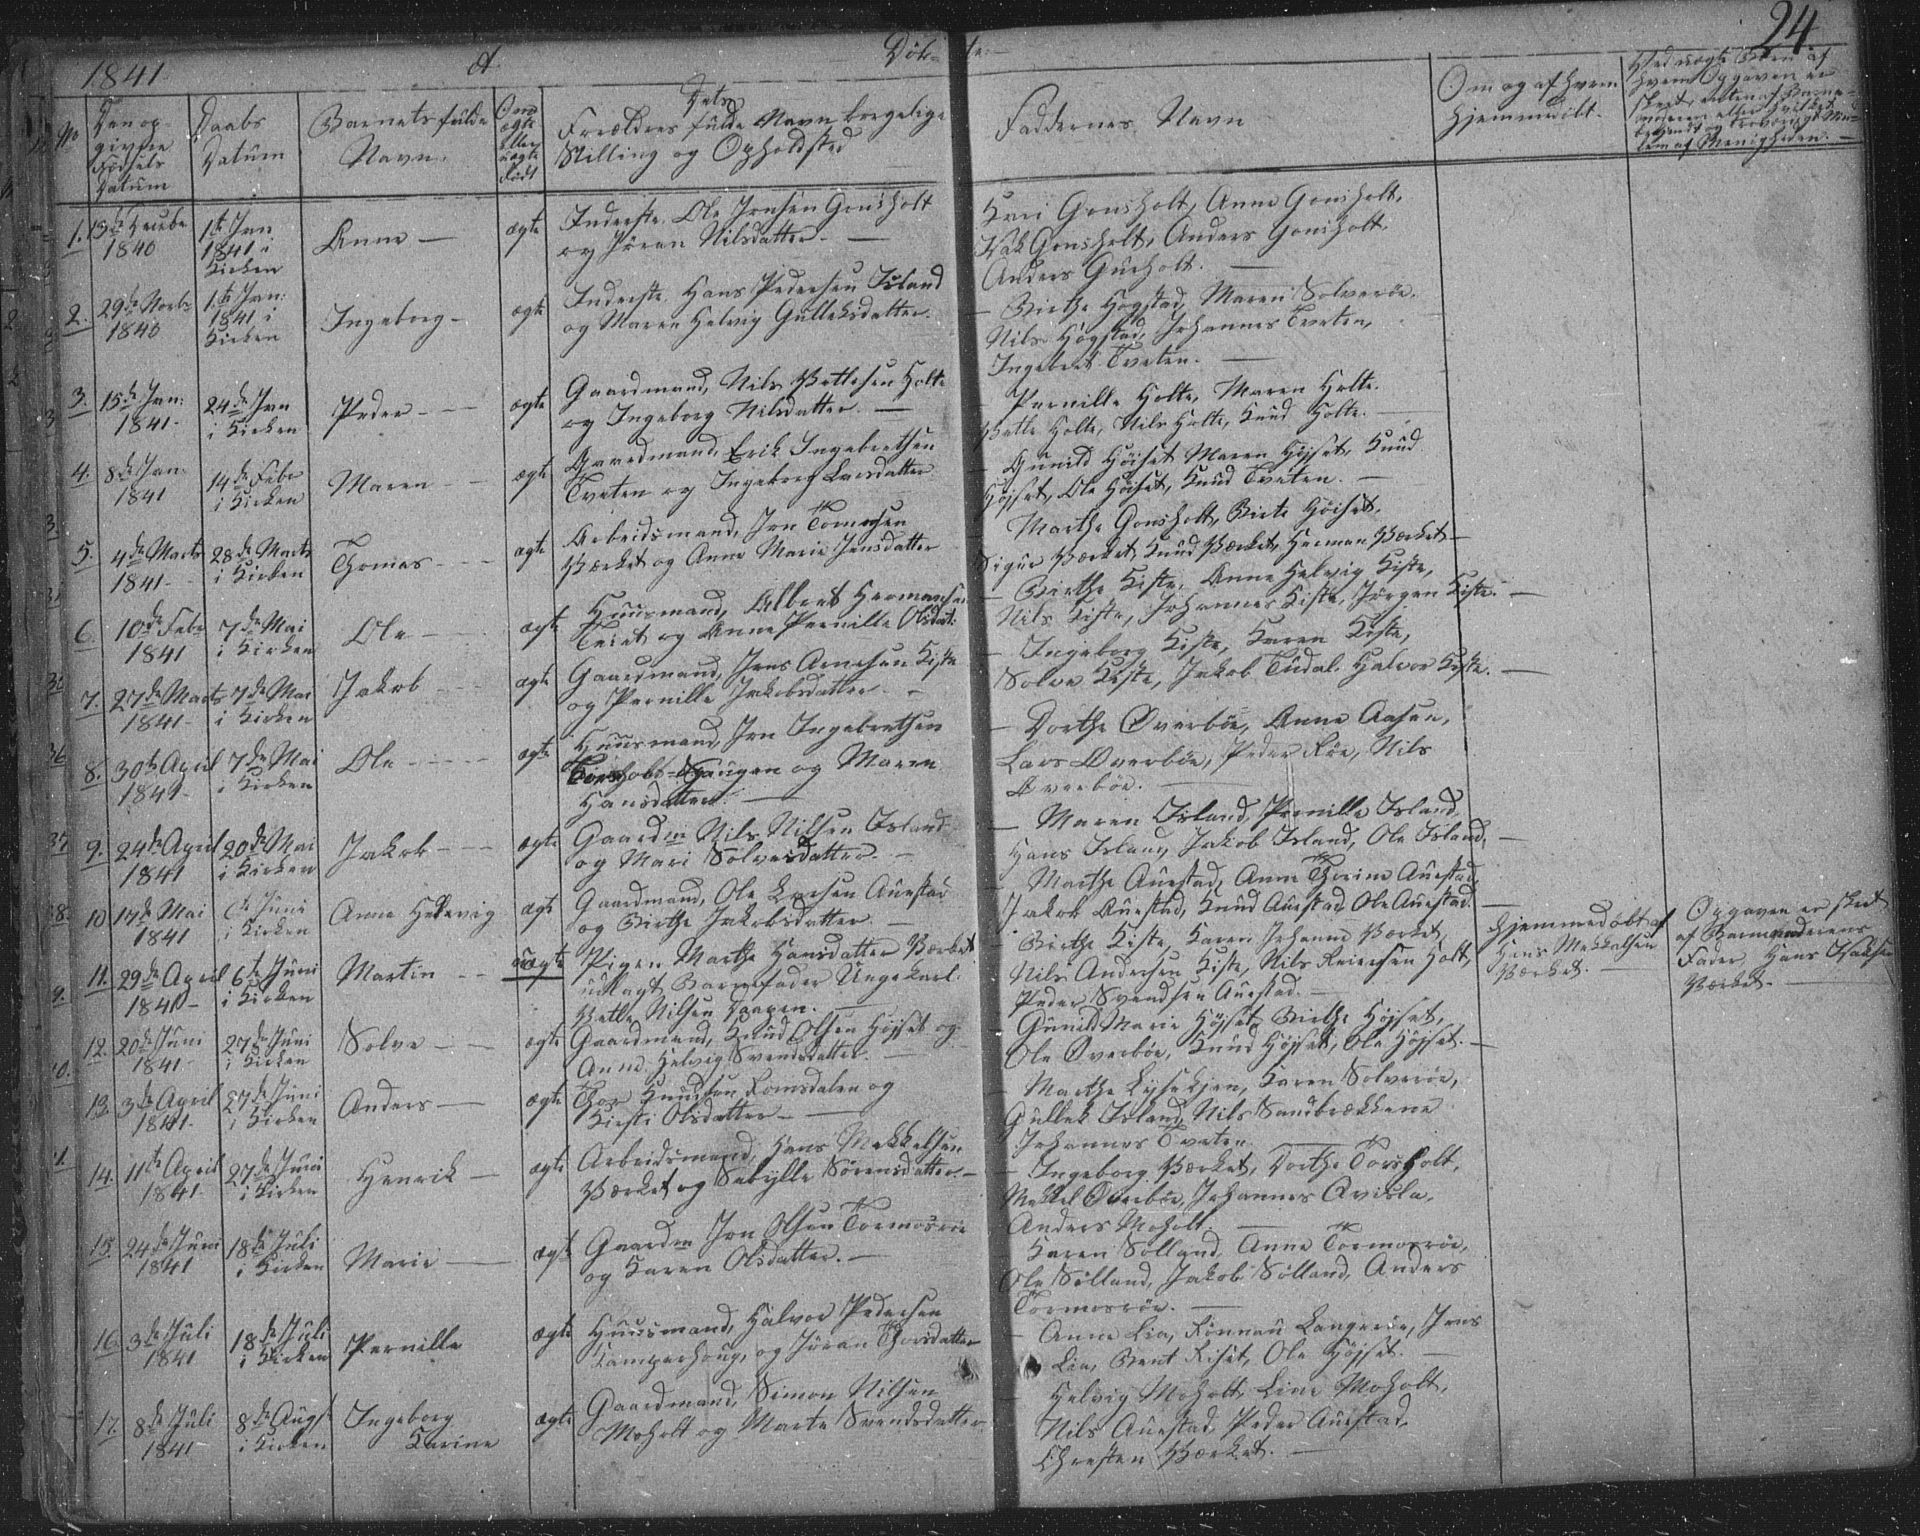 SAKO, Siljan kirkebøker, F/Fa/L0001: Parish register (official) no. 1, 1831-1870, p. 24